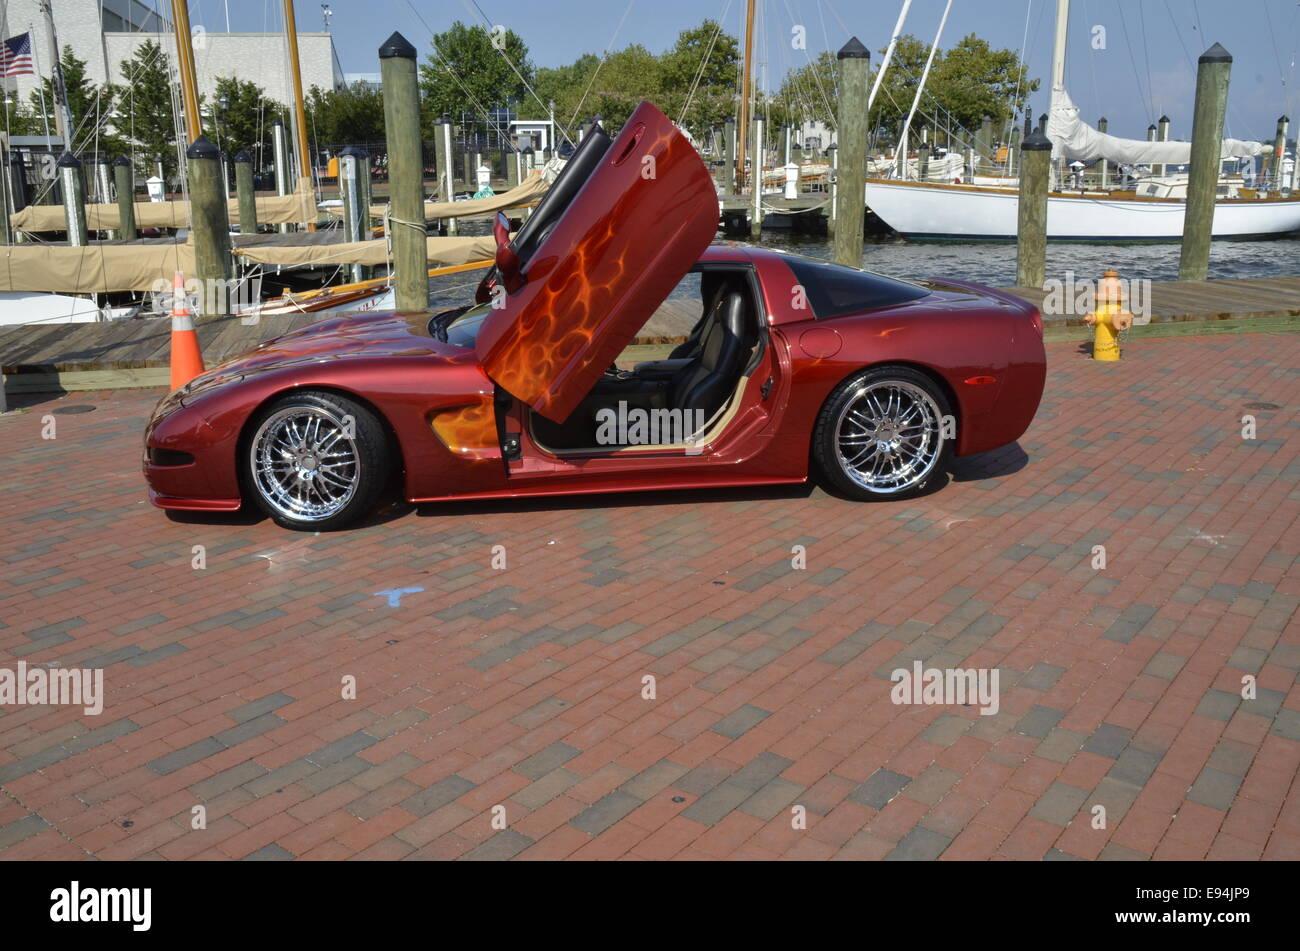 Late model Chevrolet Corvette Stock Photo, Royalty Free Image ...